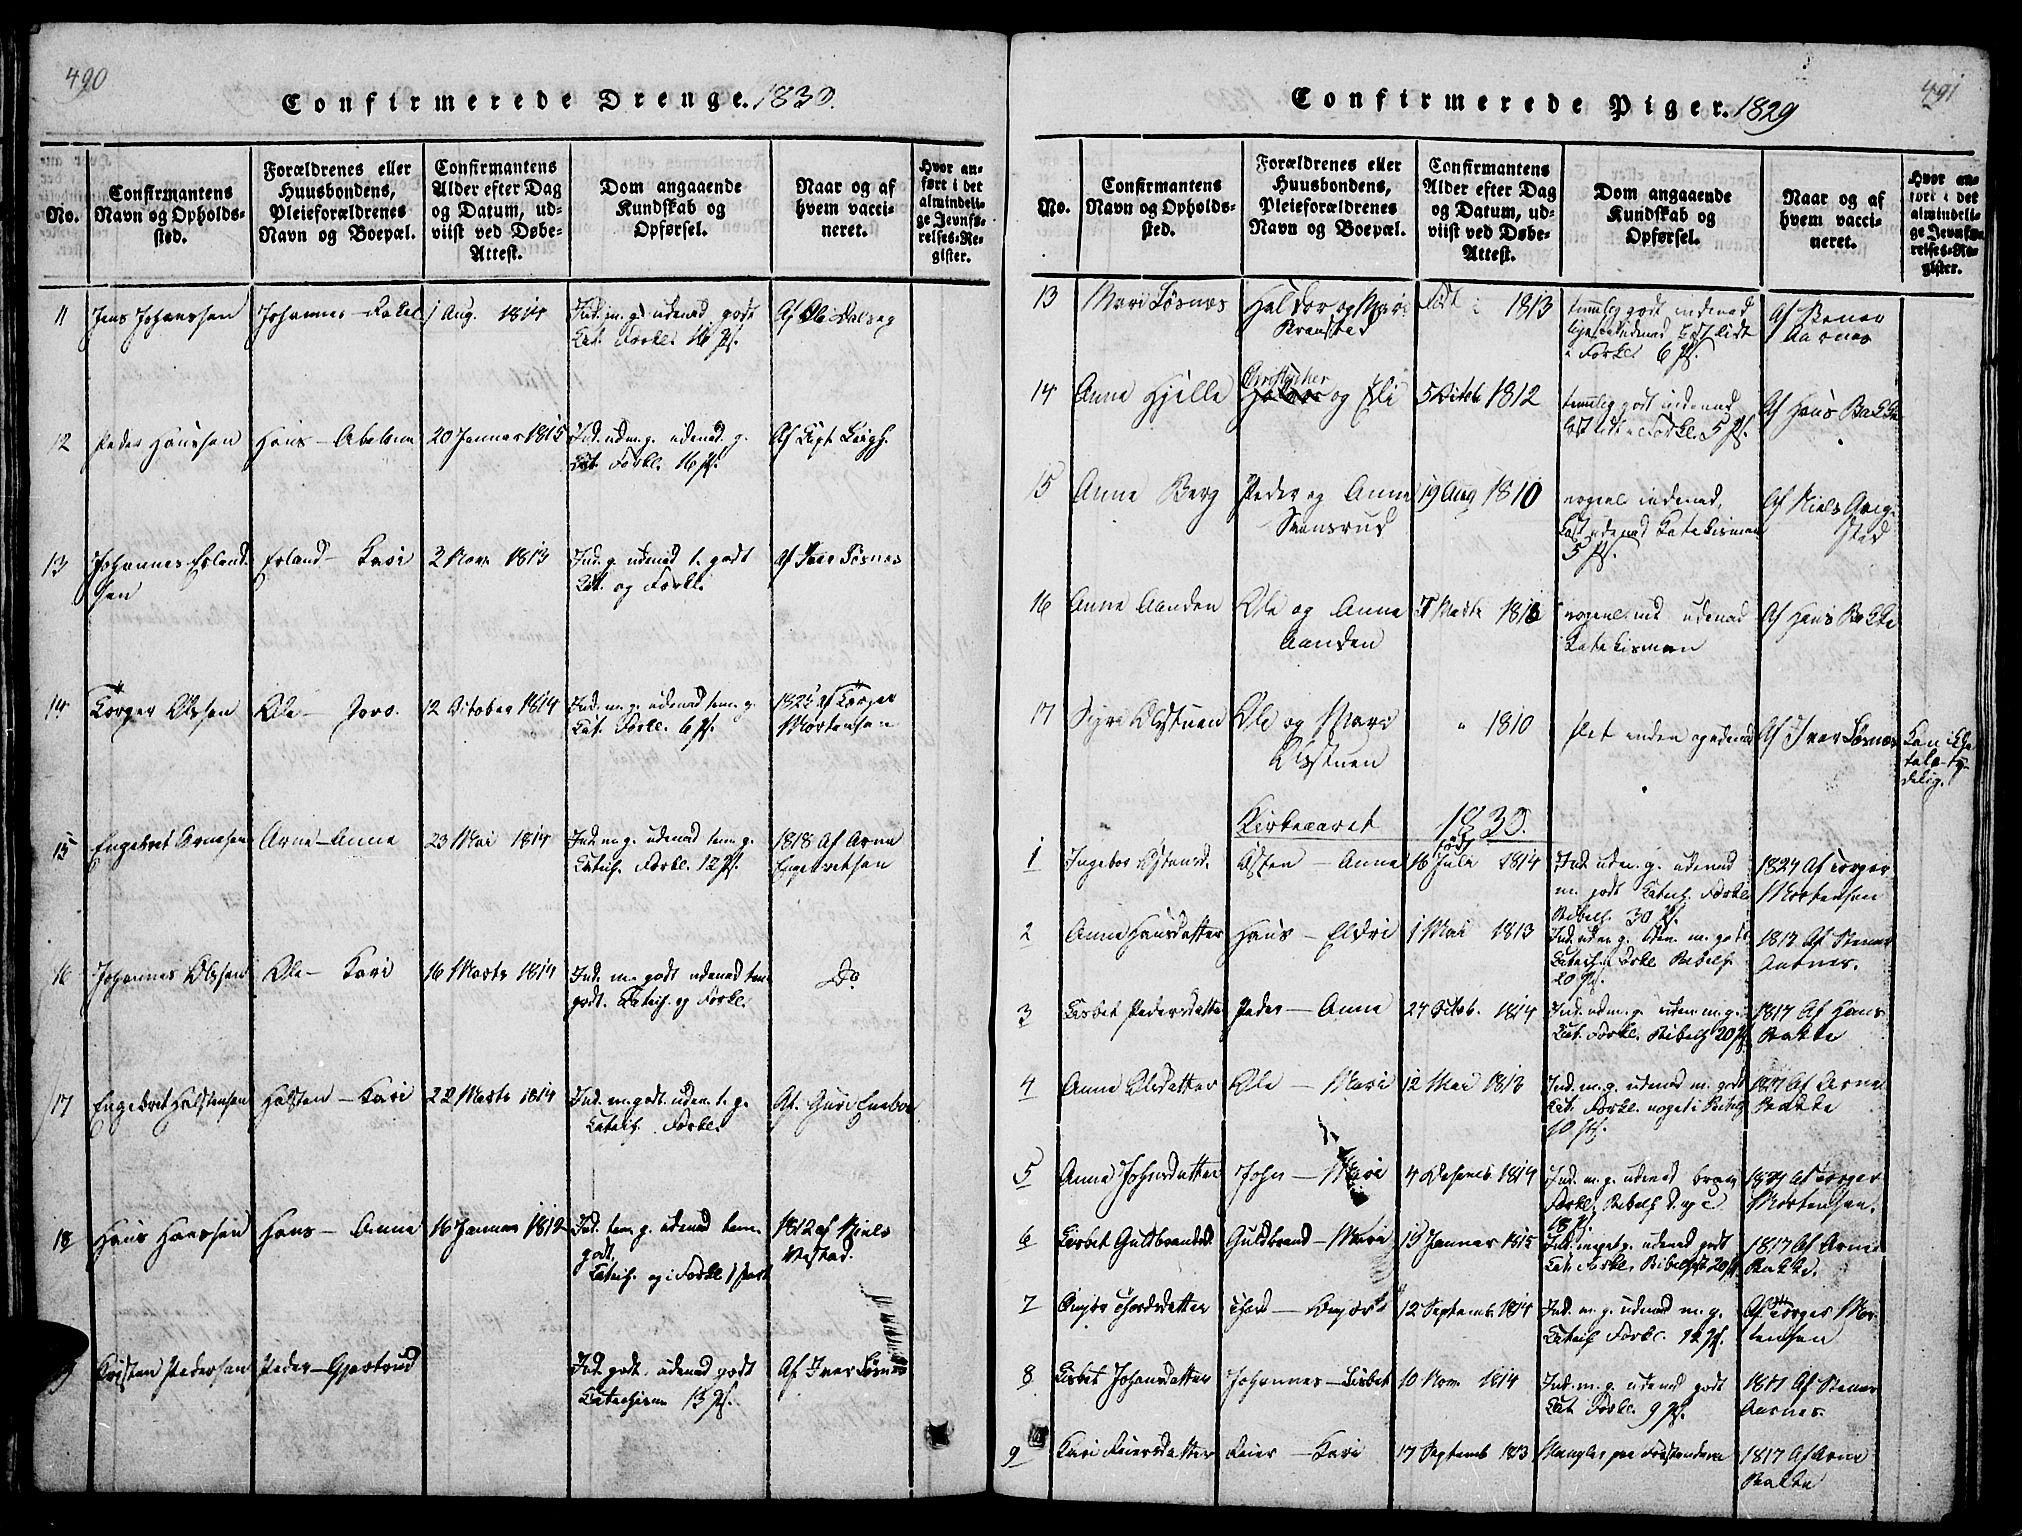 SAH, Ringebu prestekontor, Klokkerbok nr. 1, 1821-1839, s. 490-491